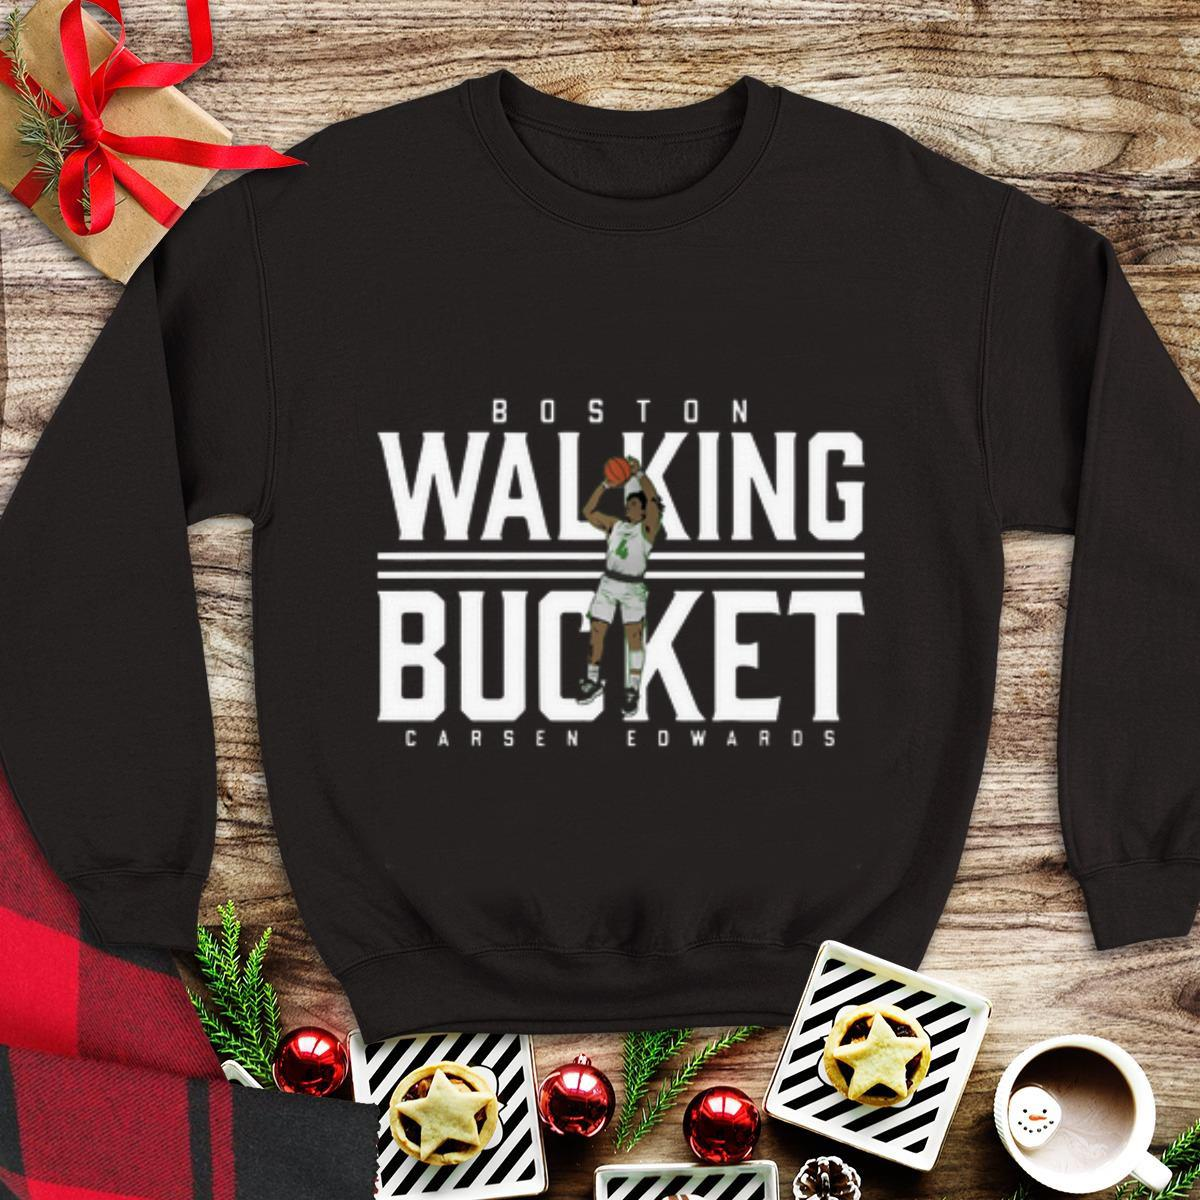 Awesome Boston Walking Bucket Carsen Edwards Shirt 1 1.jpg